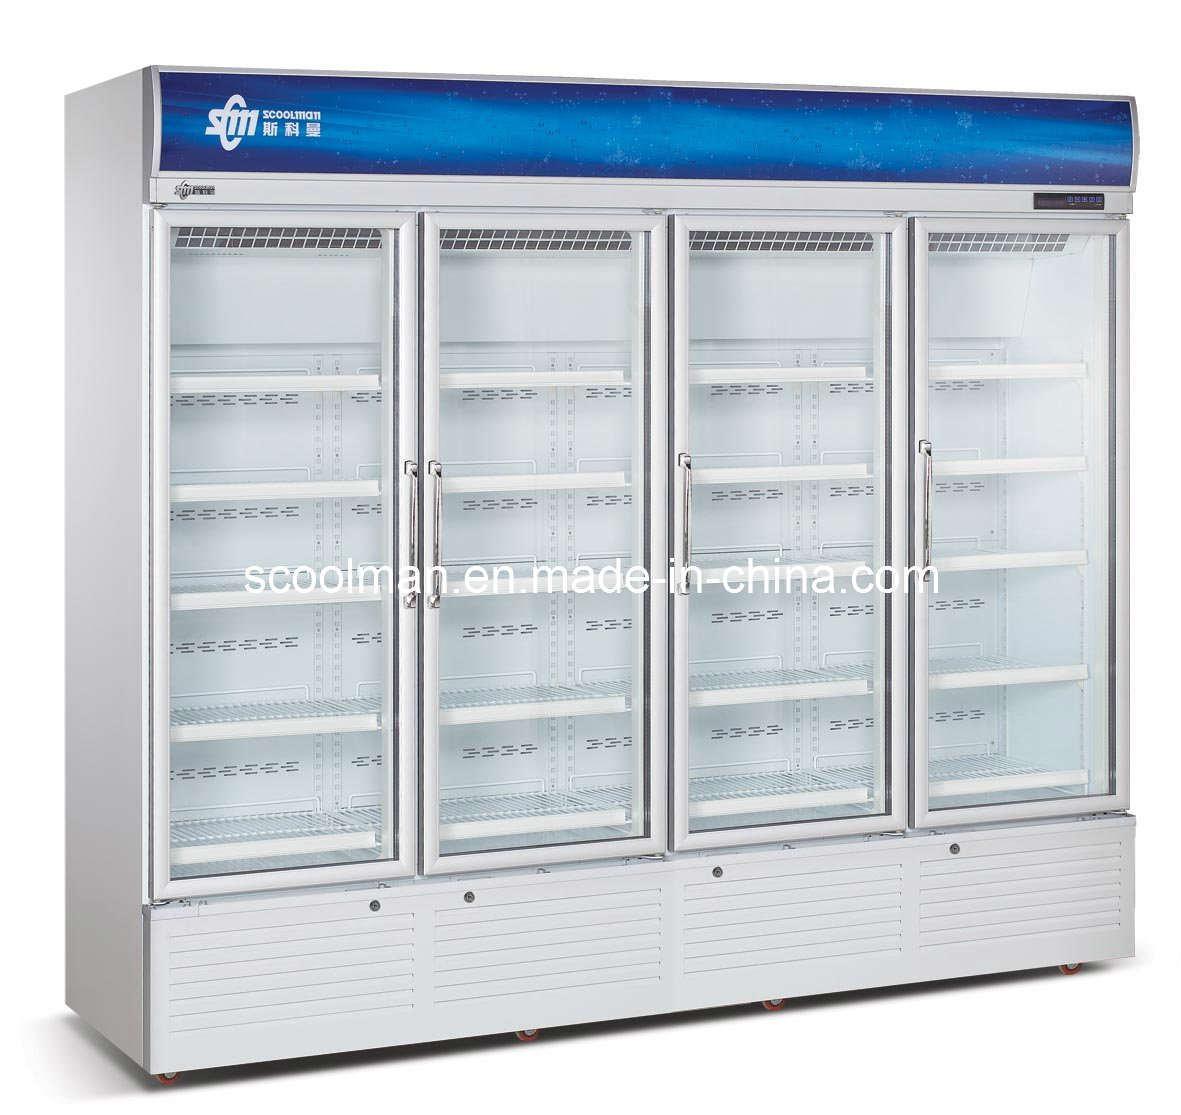 Commercial Refrigeration Equipment Co. Ltd.のために日本 #0777BC